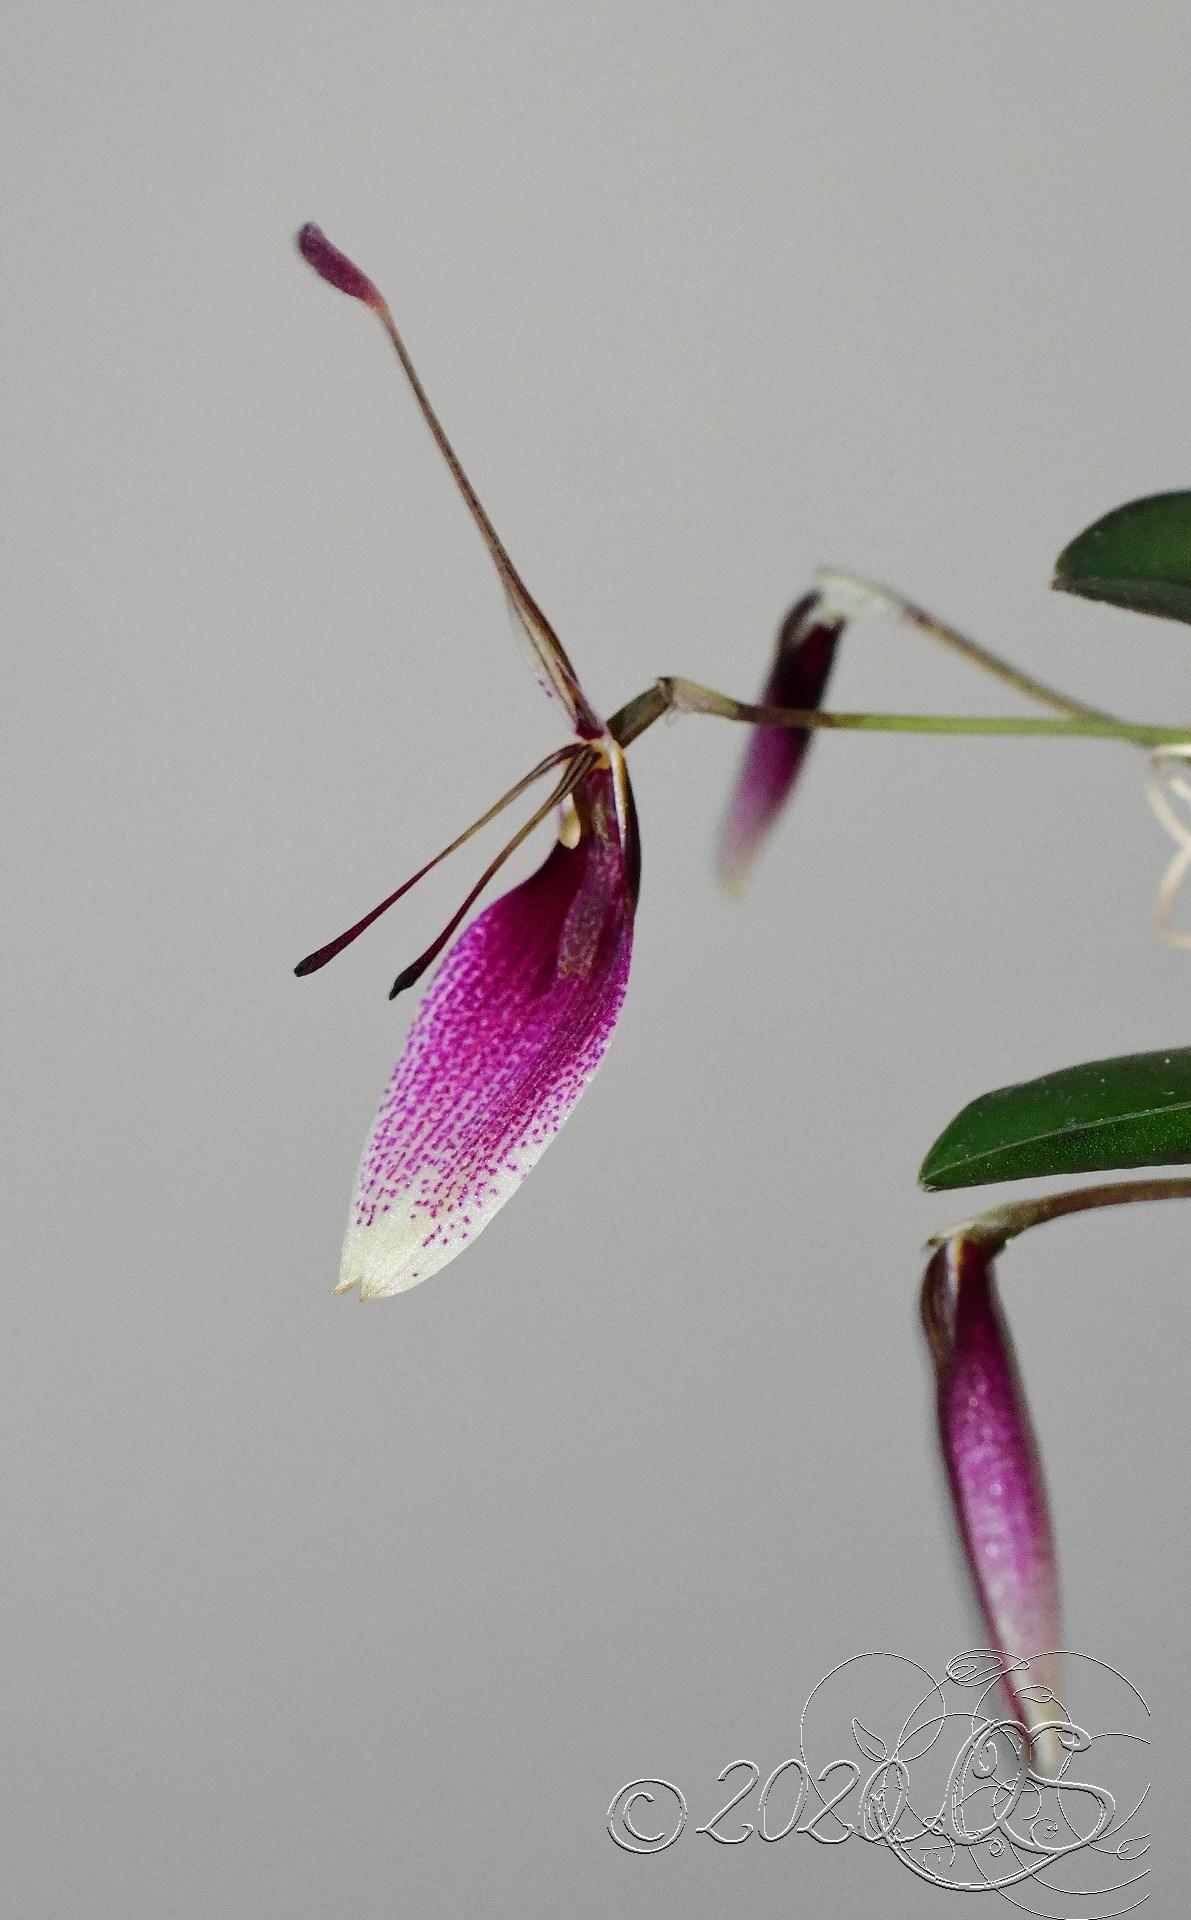 Miniatur-Orchideen Teil 6 - Seite 15 Restrepia-seketii-2